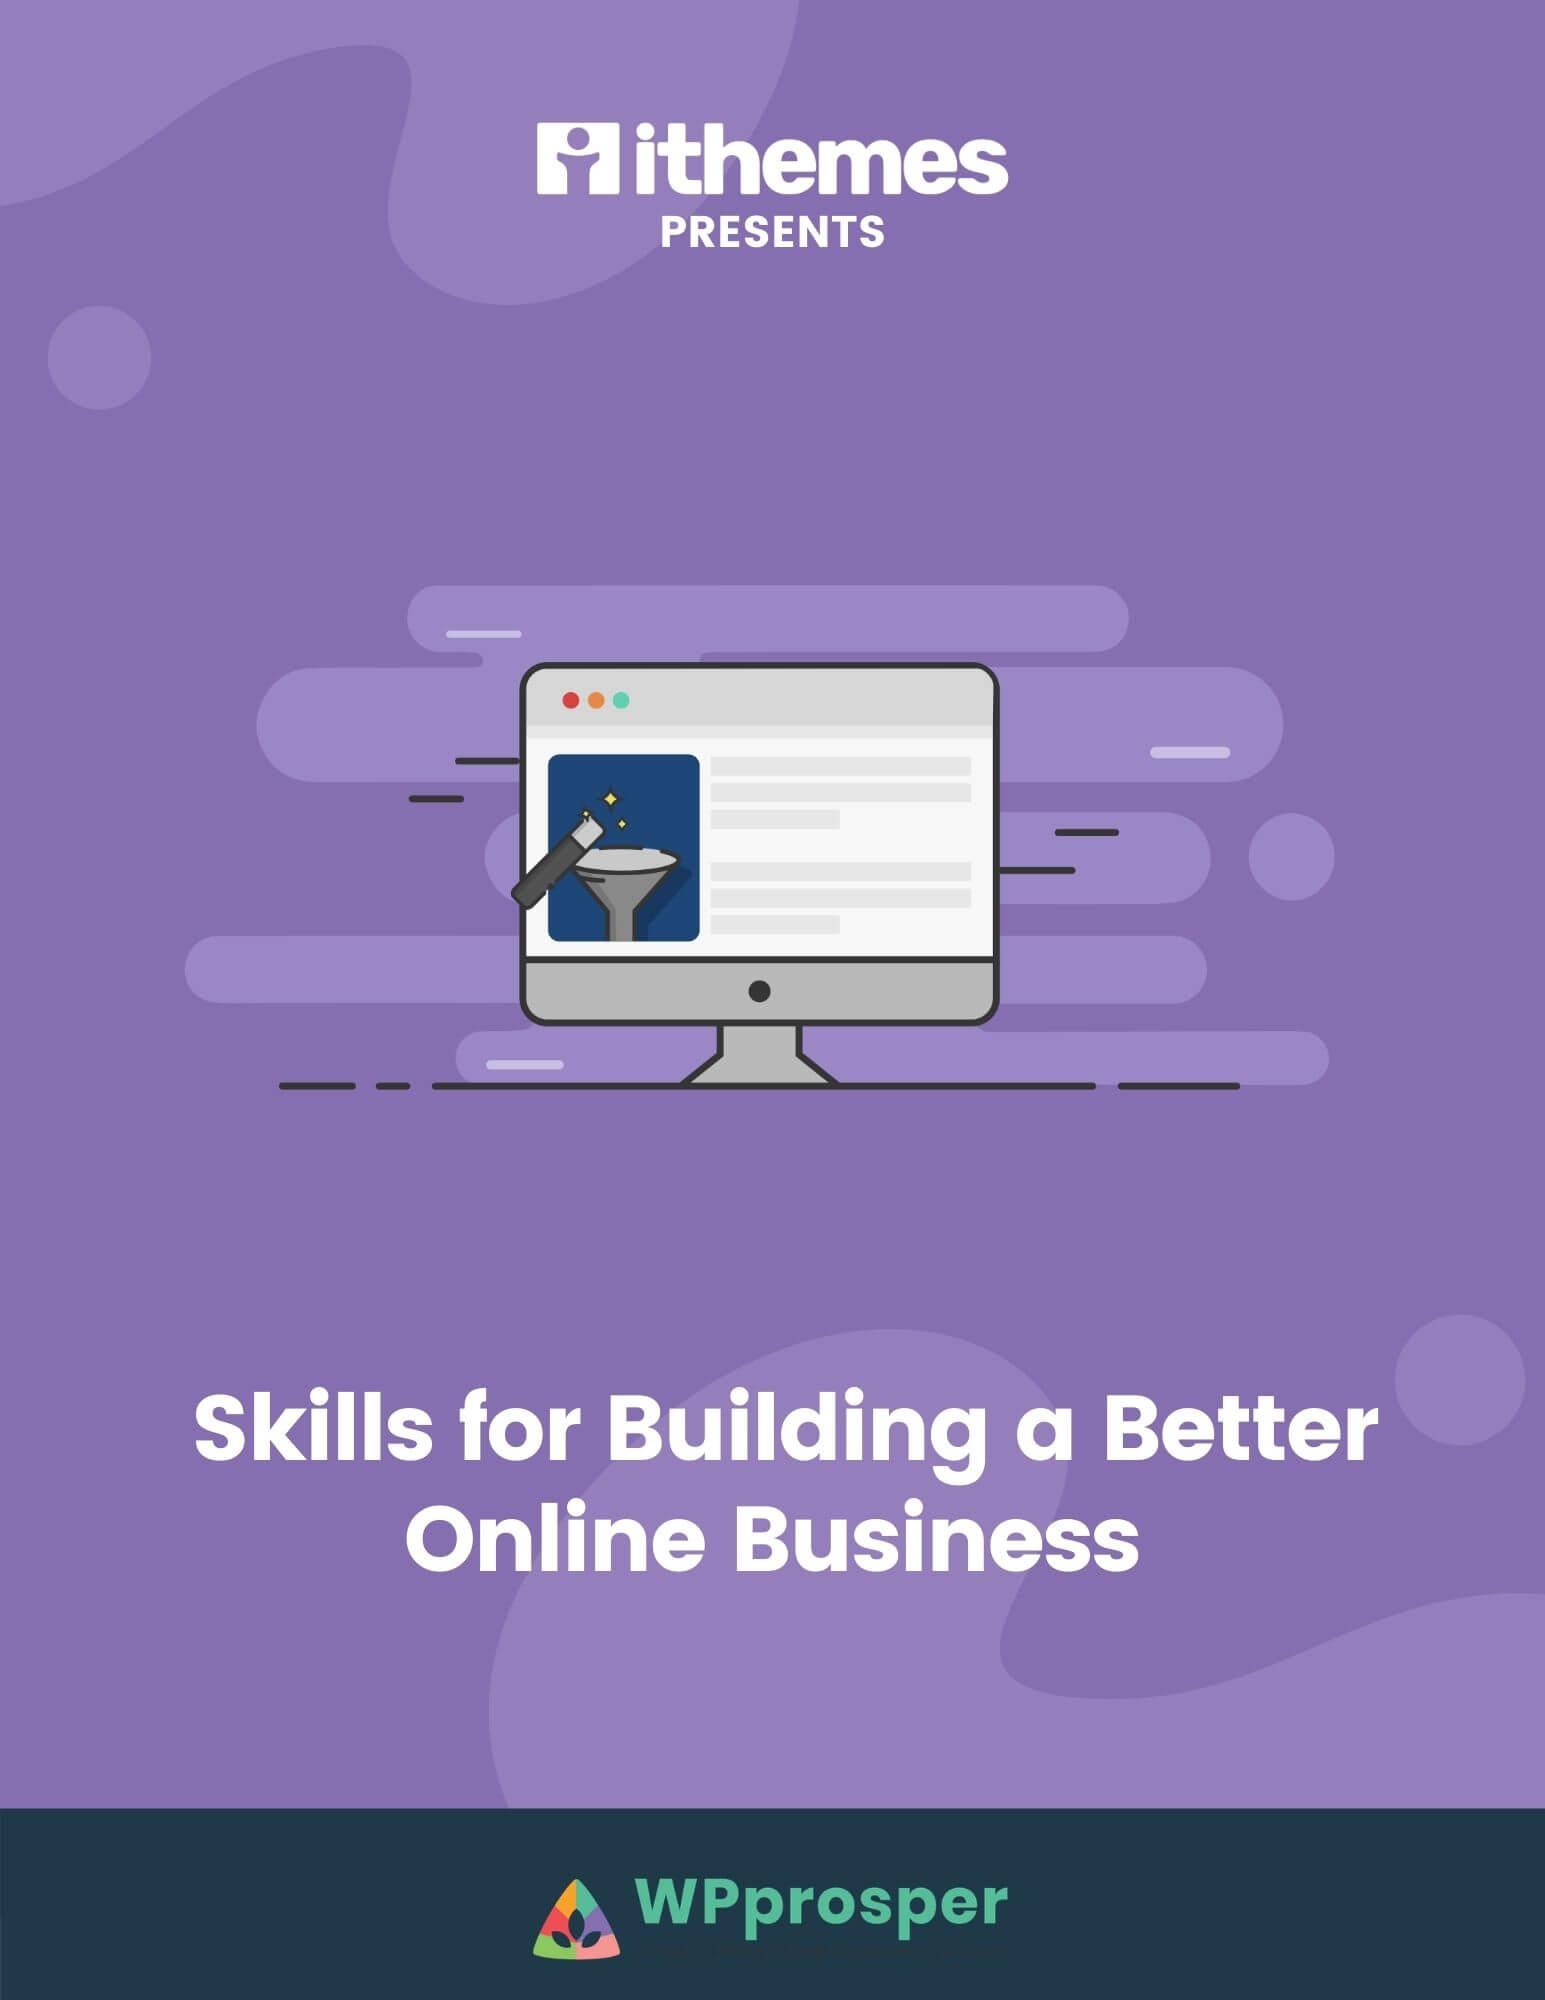 skills for building better business